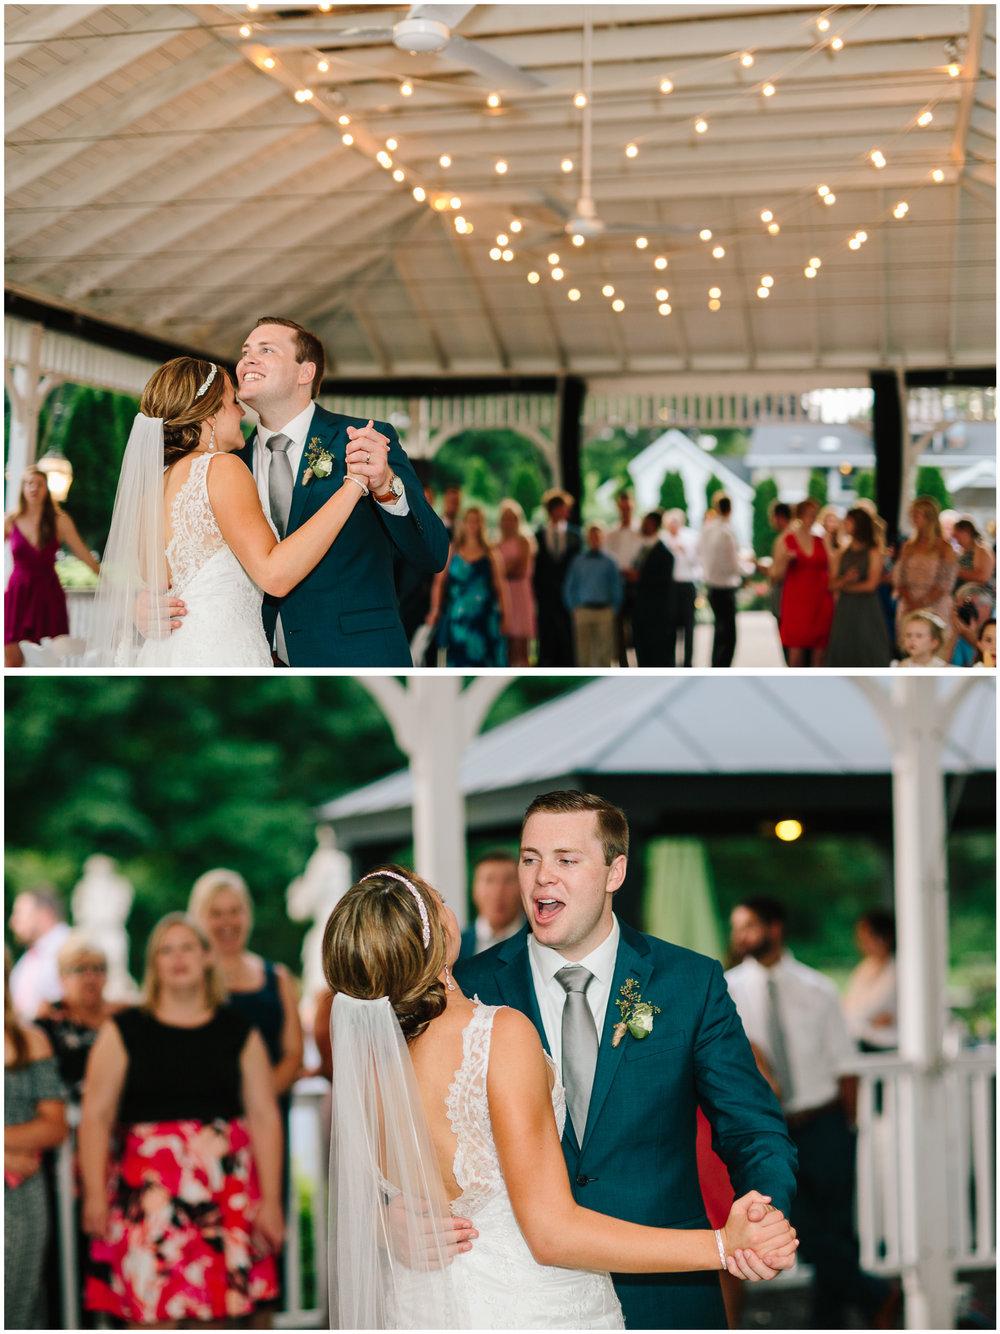 ann_arbor_michigan_wedding_90.jpg